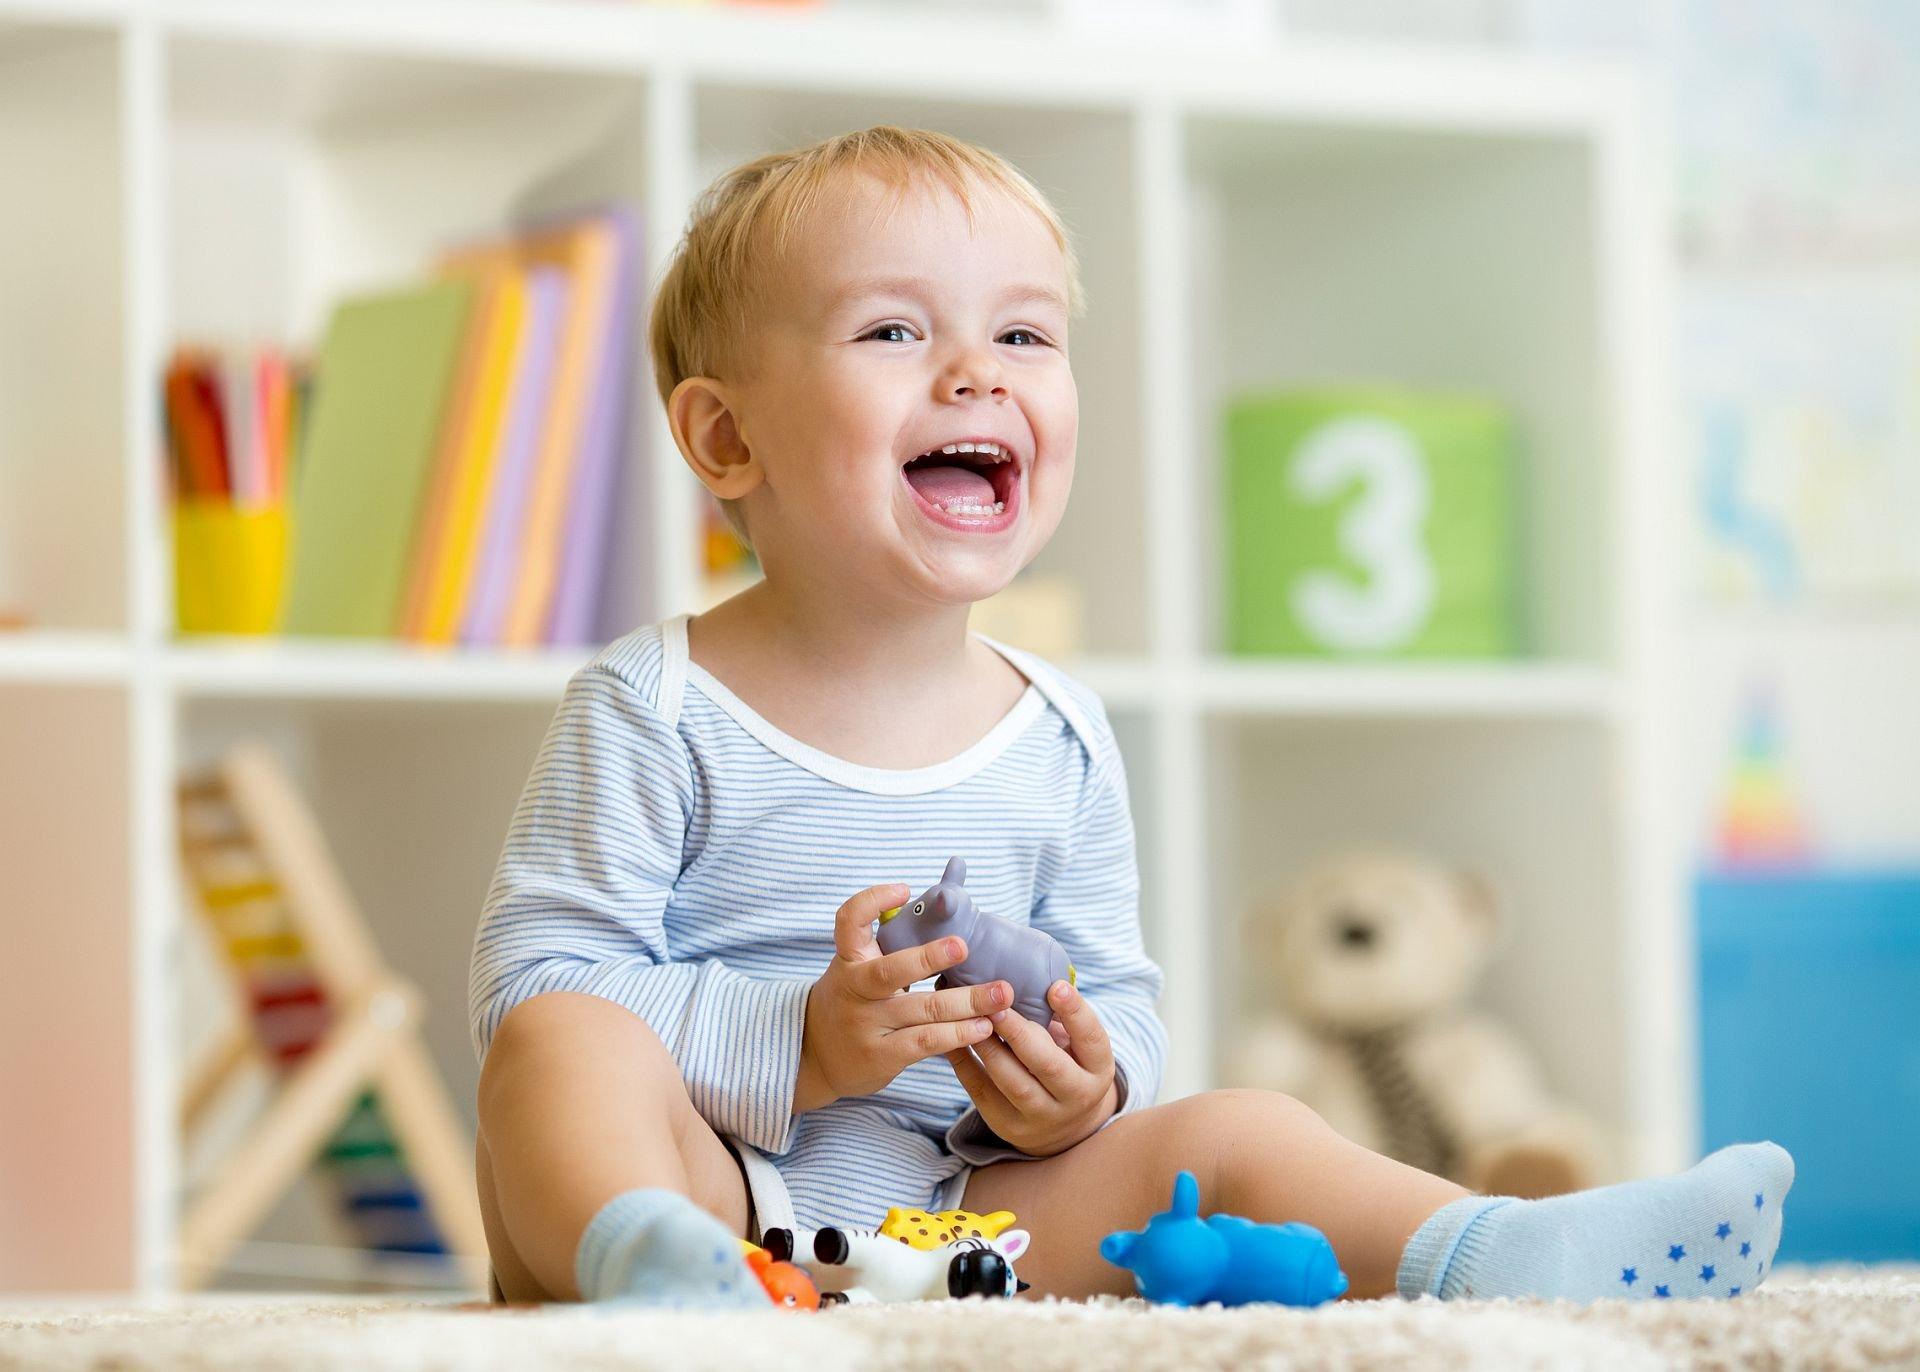 ацикловир ребенку 2 года инструкция